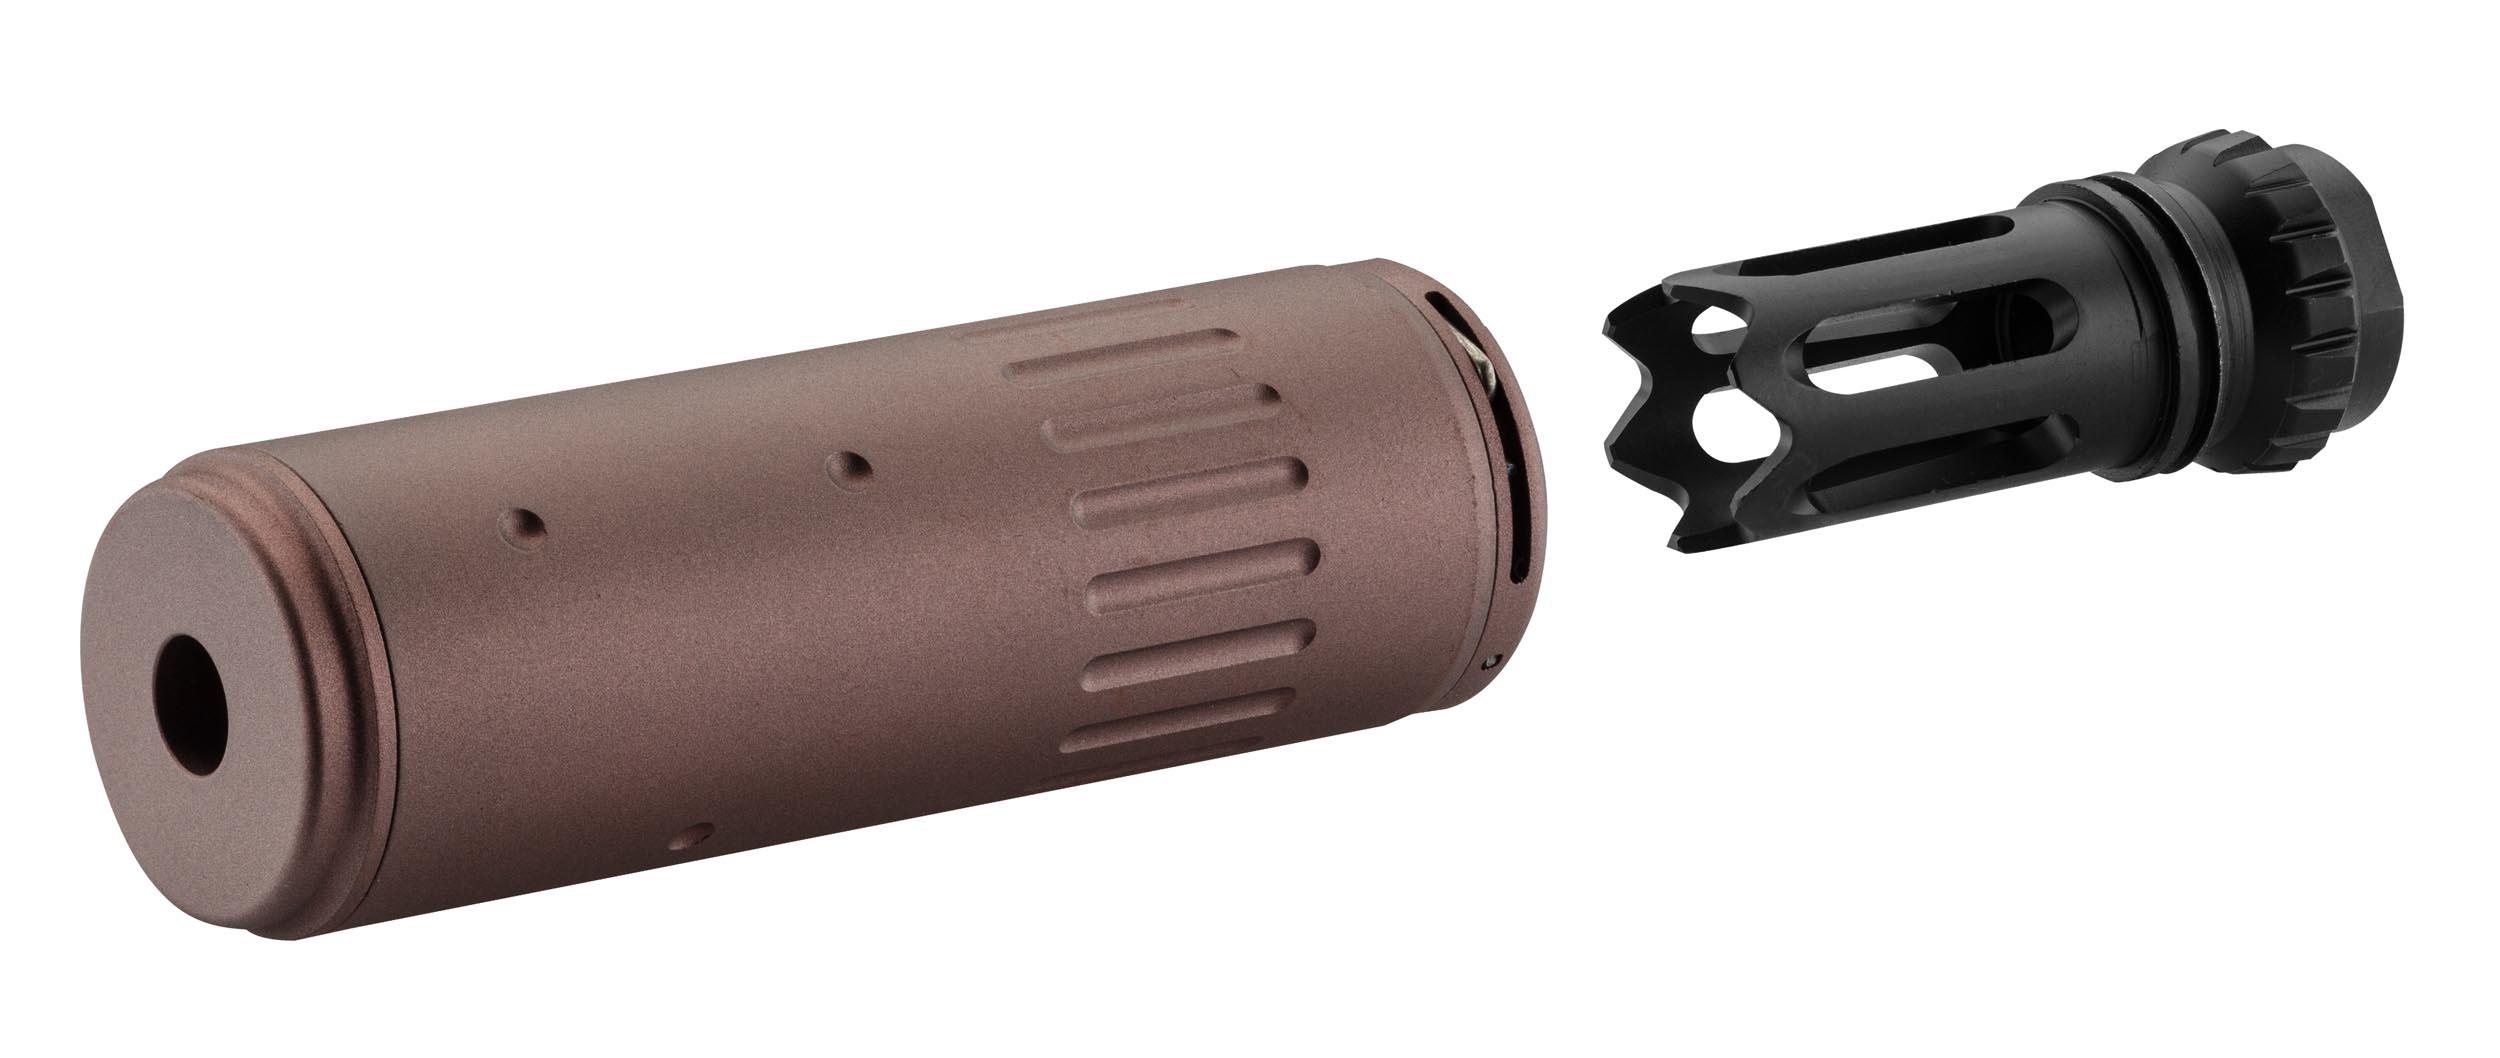 PU02001-2 AAC Style QD Silencer + Flash hider FDE - PU02001